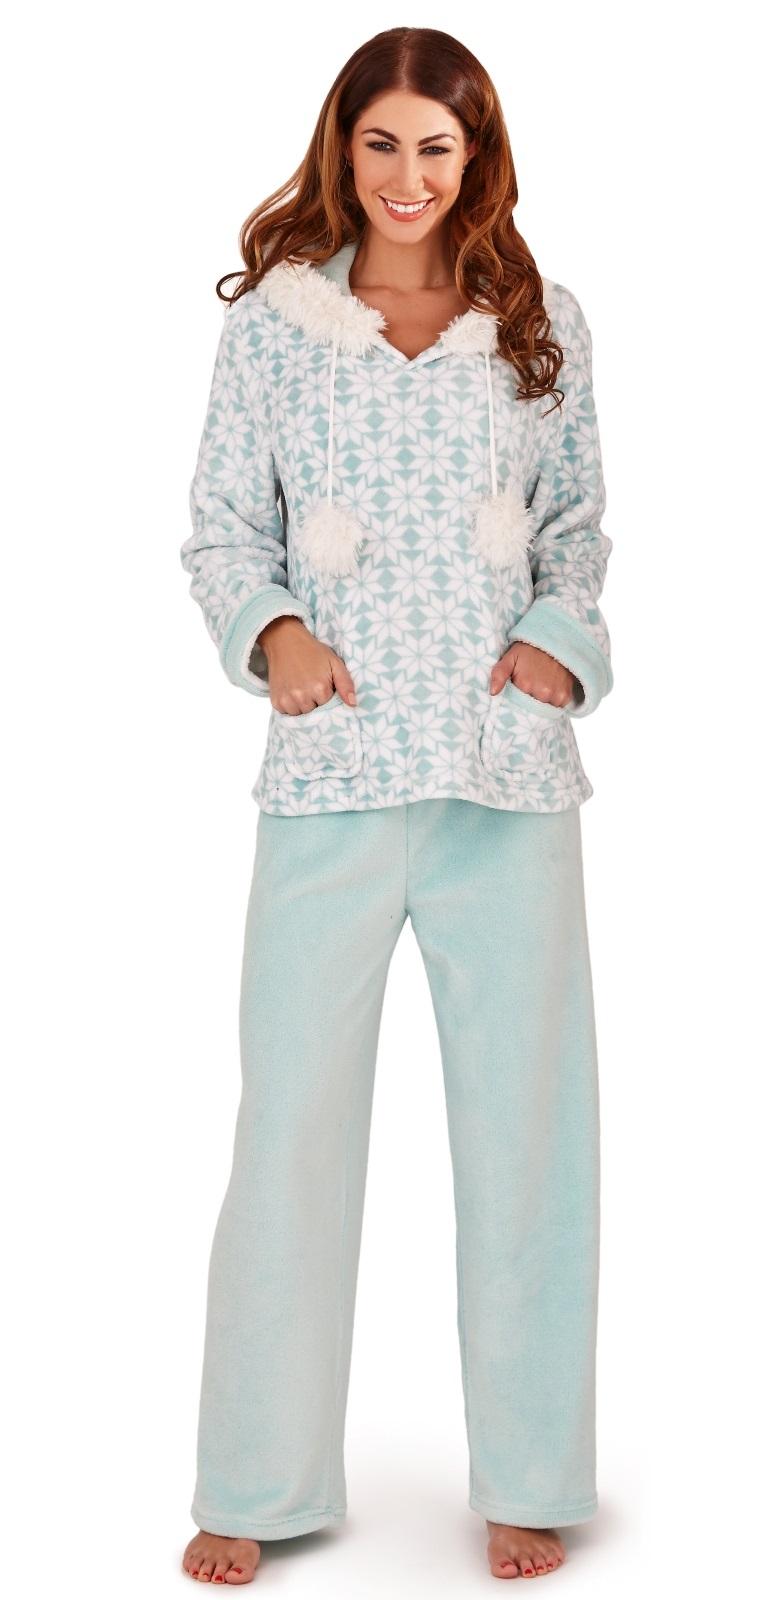 Womens Fleece Lounge Pants Hooded Jumper Set Warm